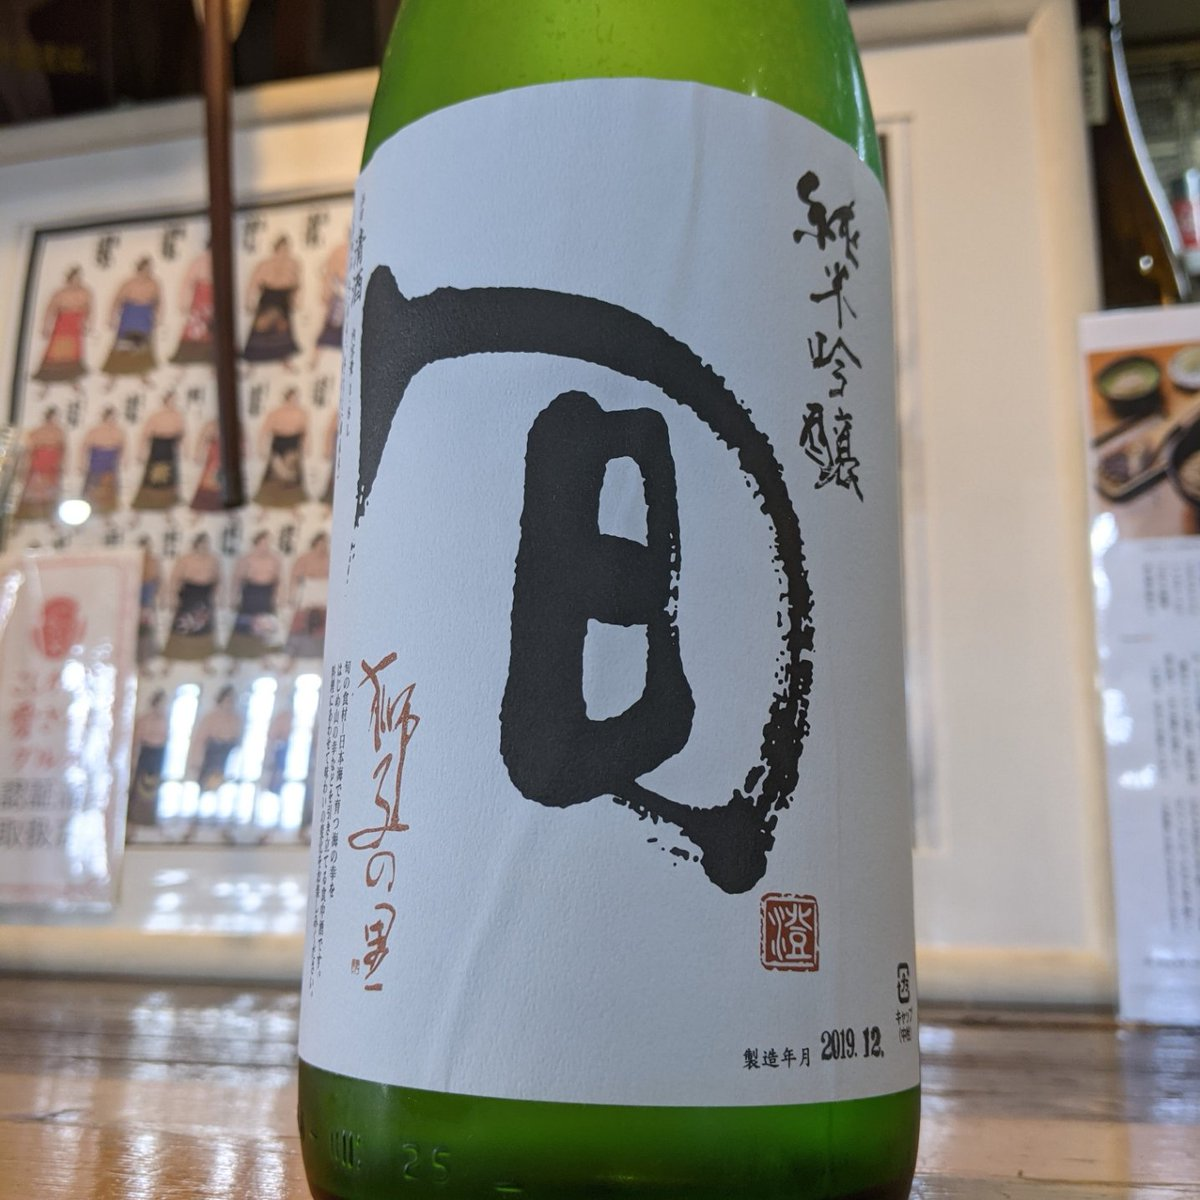 test ツイッターメディア - 【新しい地酒入荷】  獅子の里「旬」純米吟醸(石川県・松浦酒造)  透き通るような味わいでも負けない風味と清々しい酸味が心地よい酒。 上品な甘みの中にもピリッと引き締まる辛味を感じます。 飲み飽きない食中酒です。 口当たりは柔らかく、お蕎麦にも合います! 慢性的に品不足で希少な酒です https://t.co/oSccNUJhQi